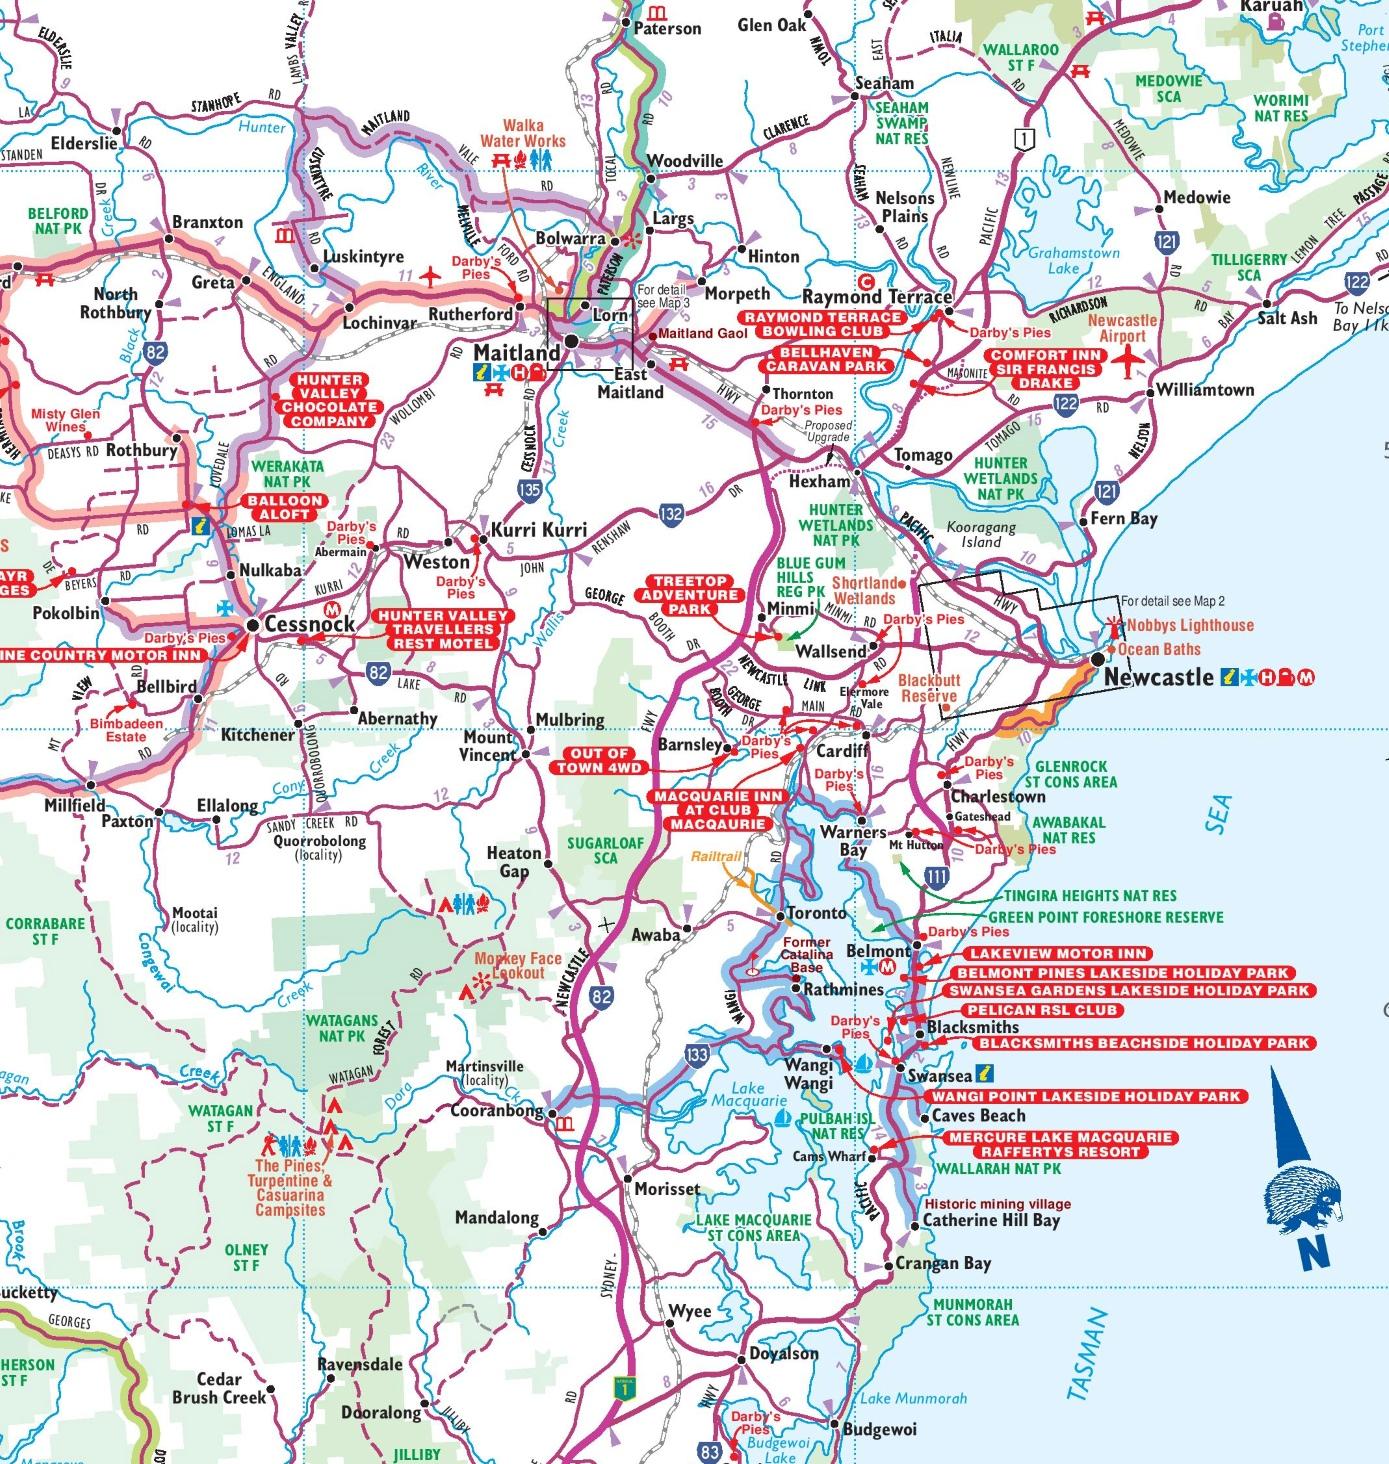 Australia Map Newcastle.Newcastle Area Map